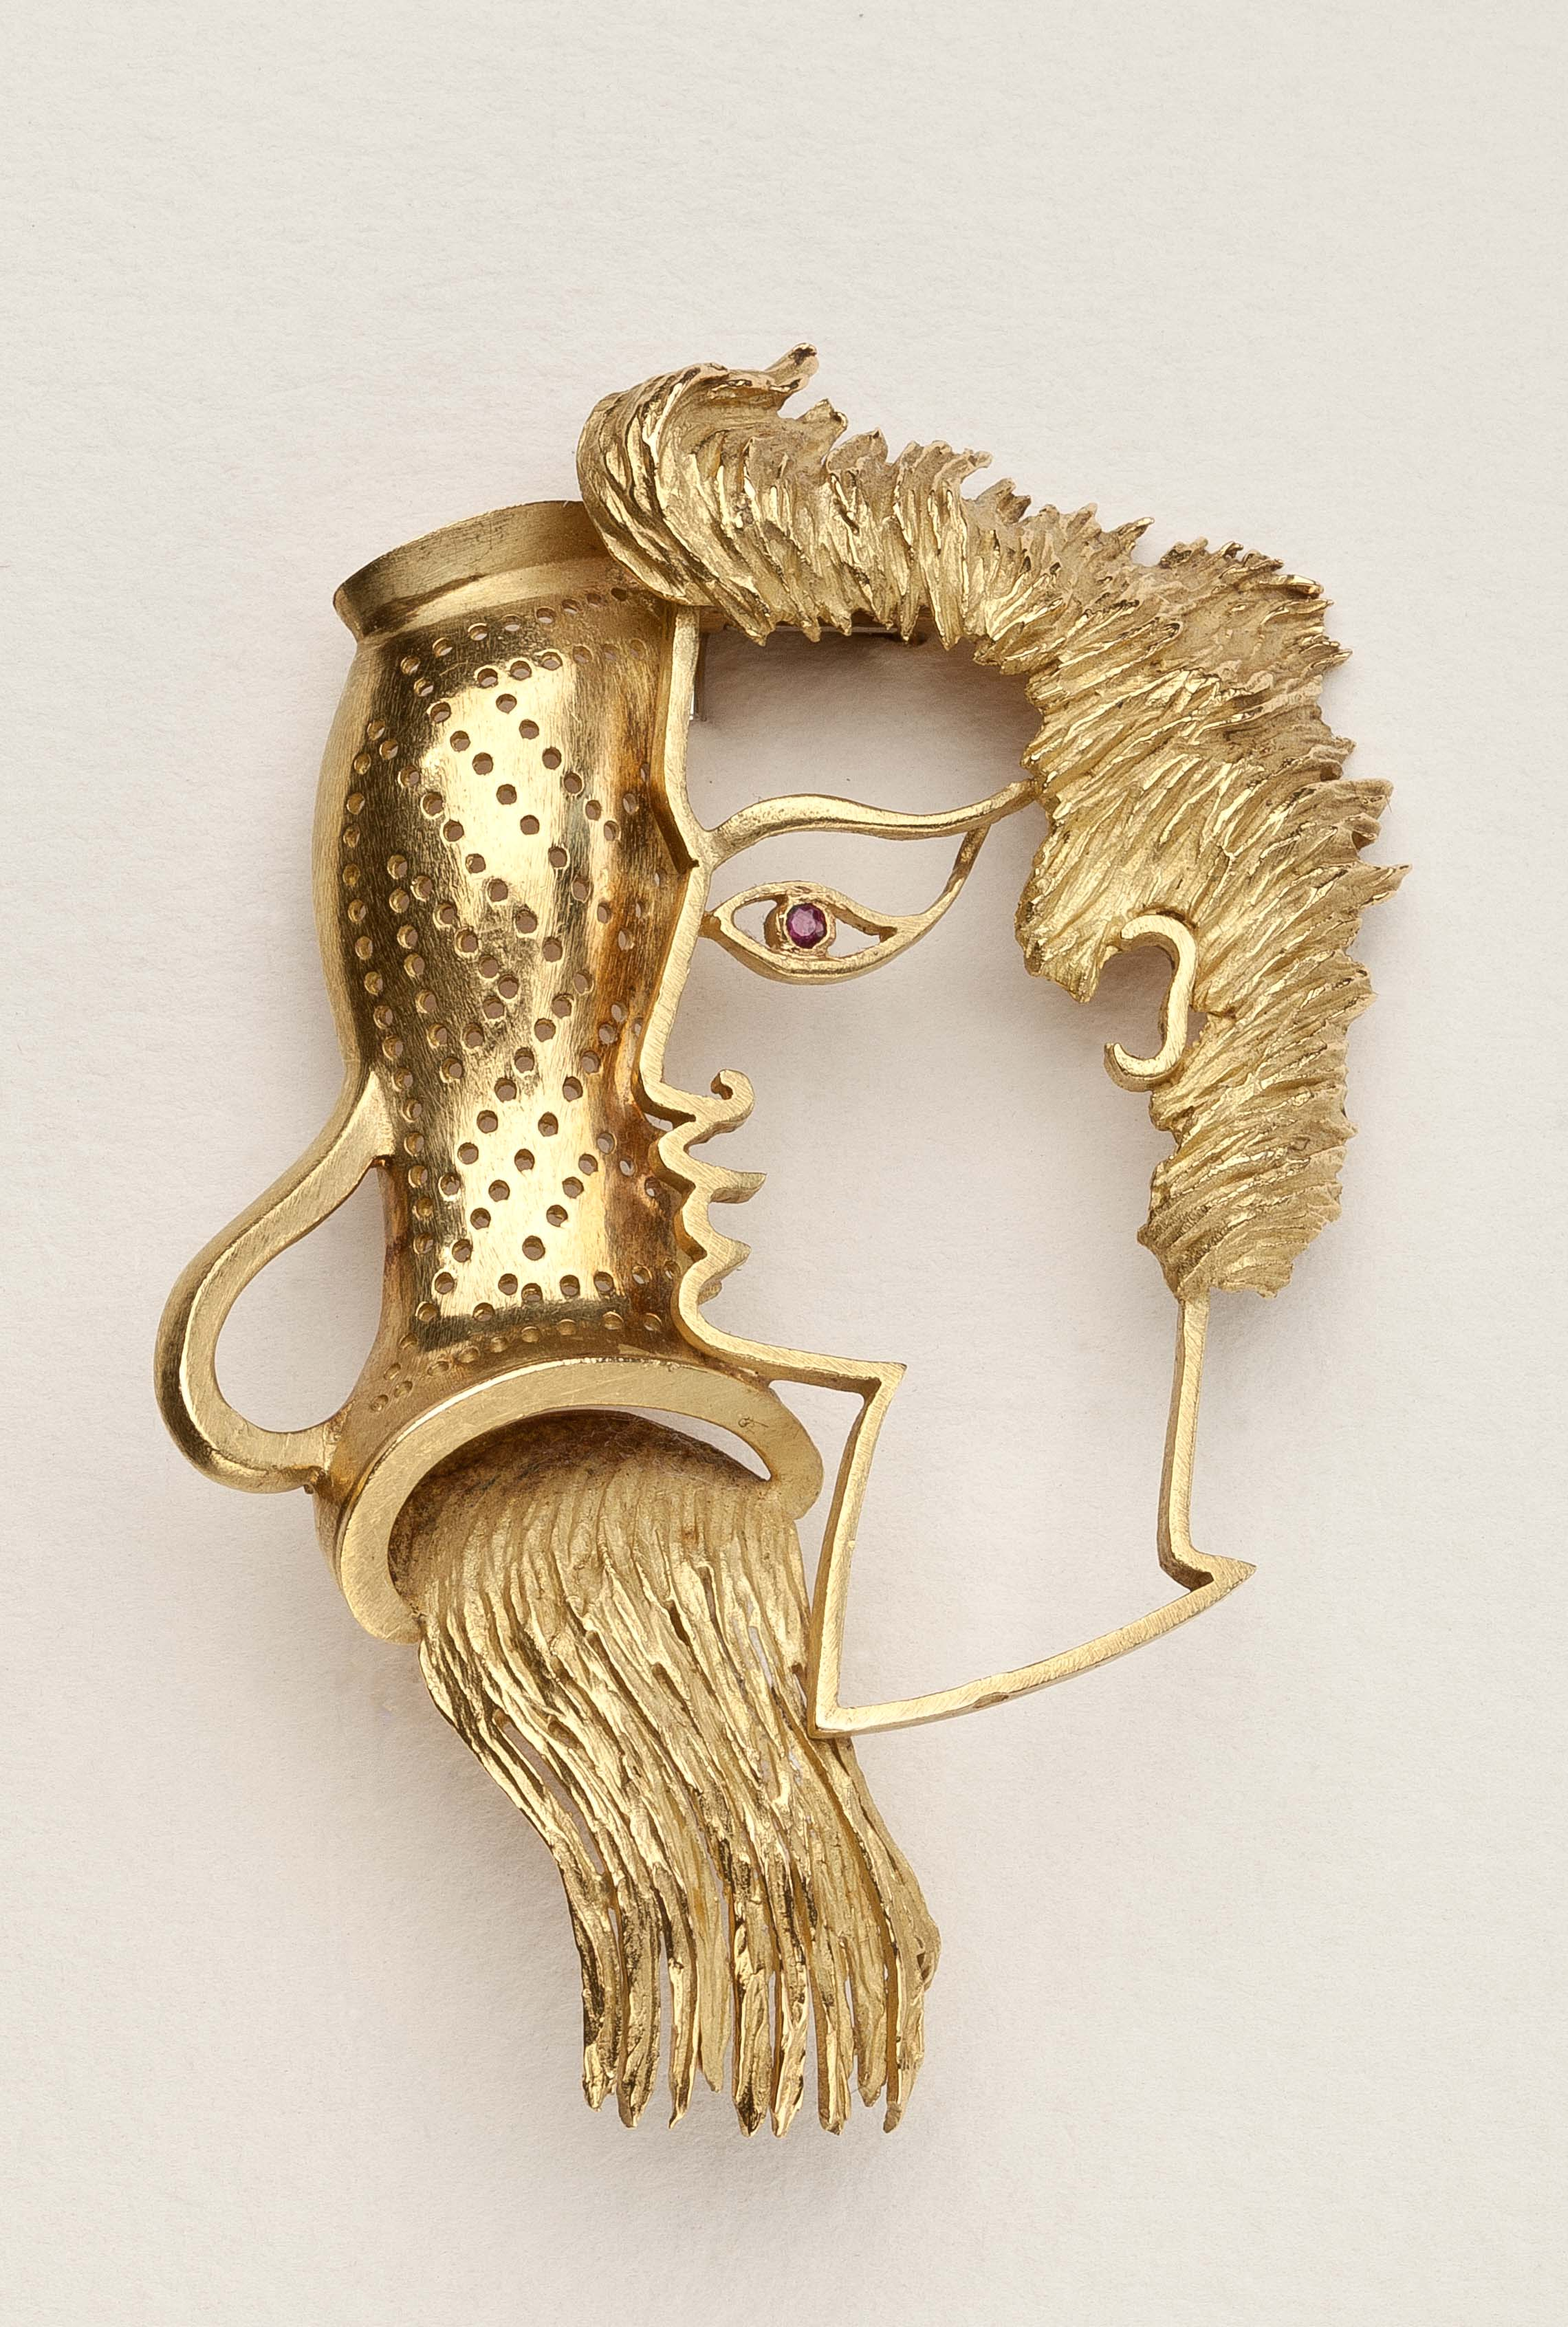 jean cocteau gold brooch.jpg